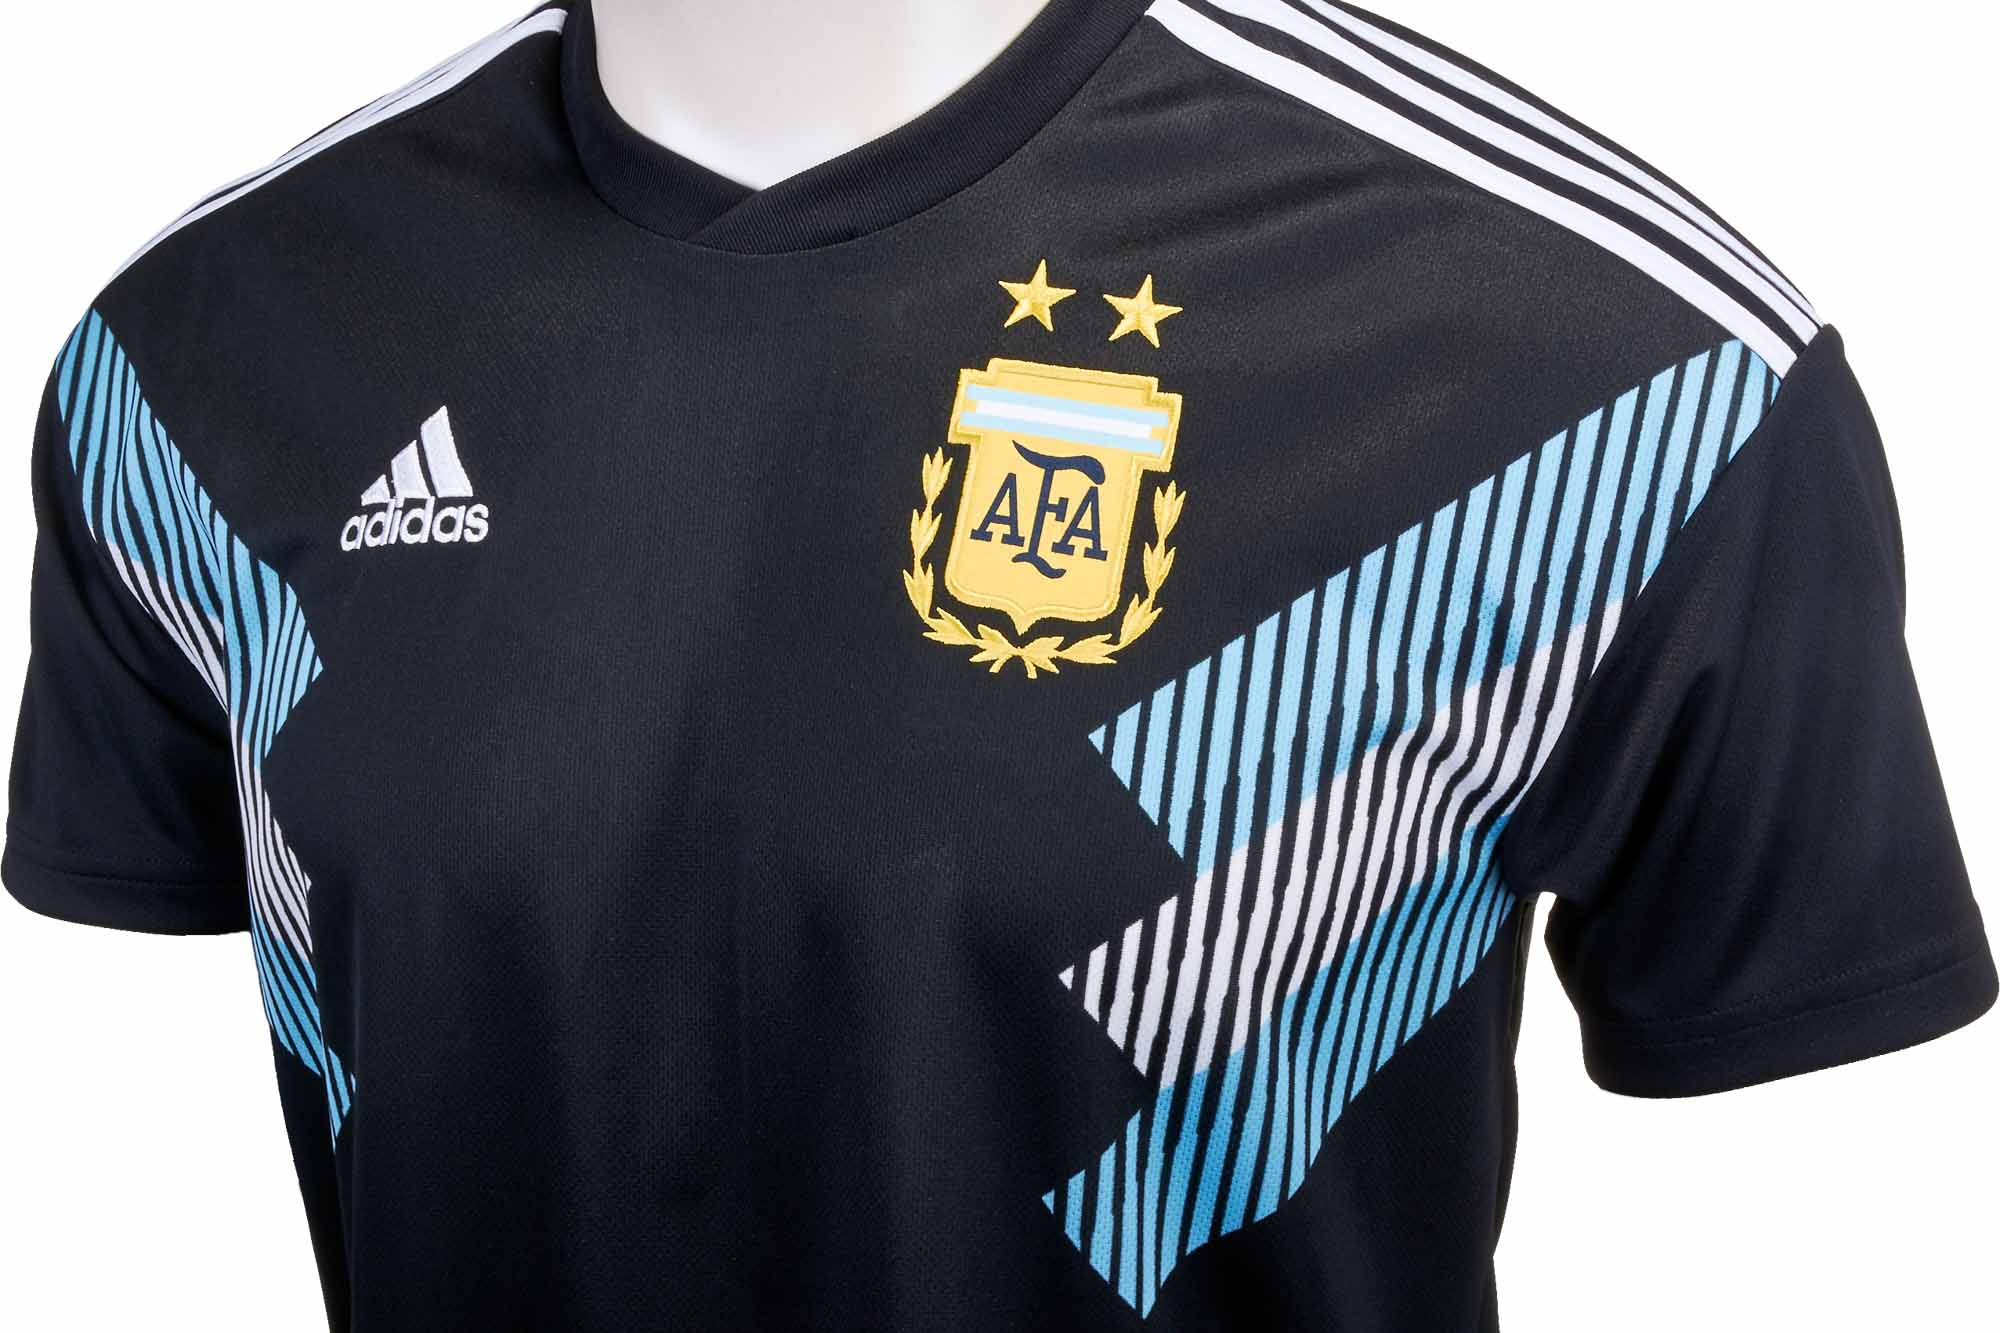 d4959c75d32 adidas Argentina Away Jersey 2018-19 NS - Soccer Master